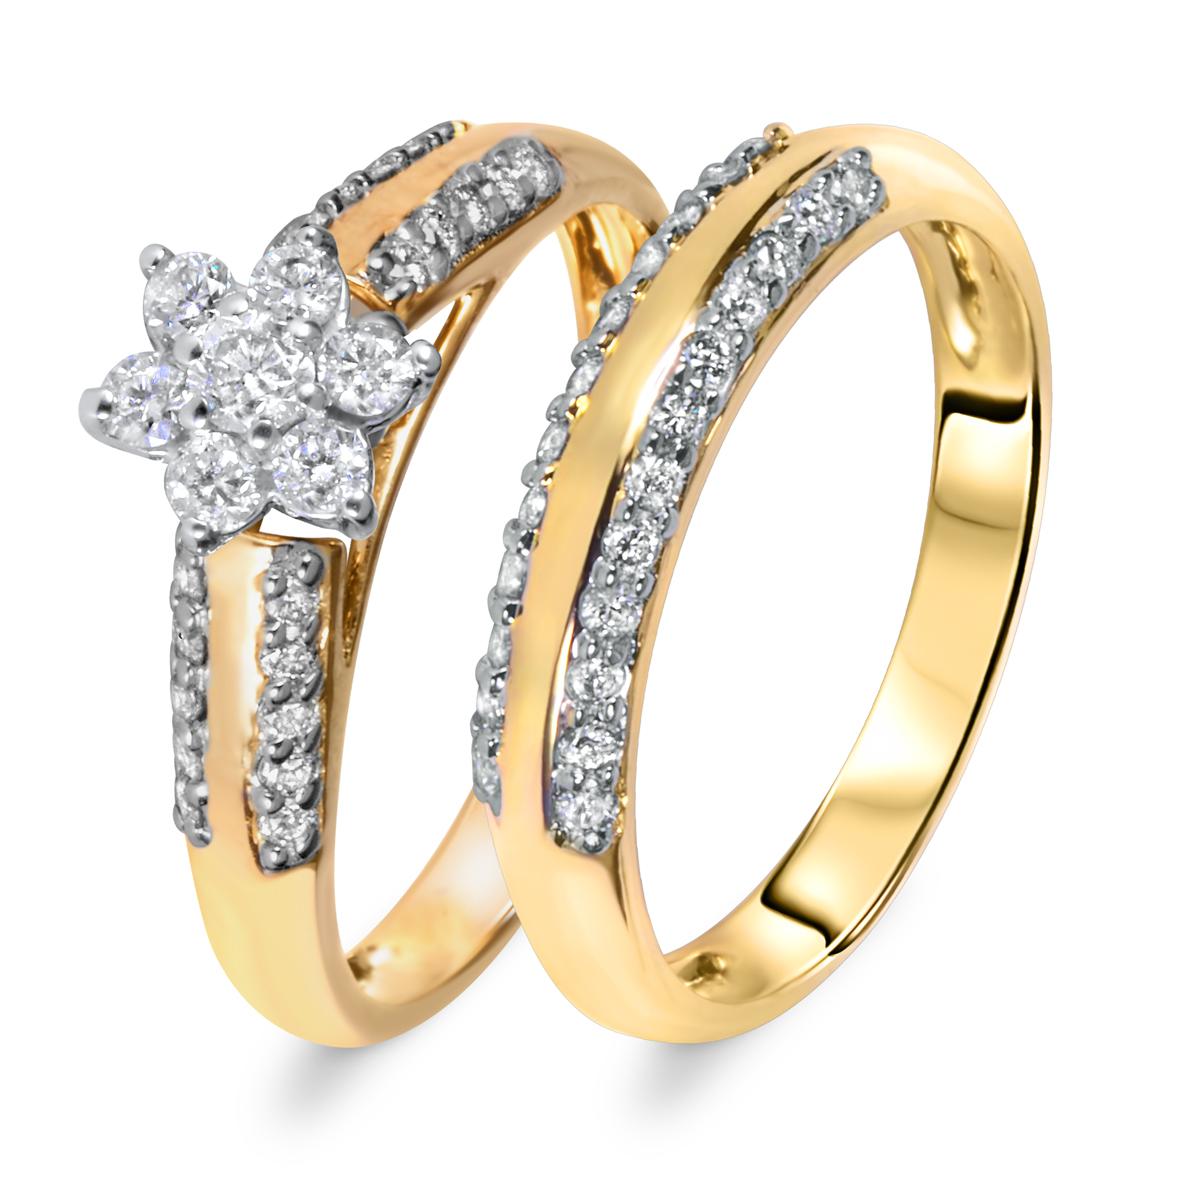 3/4 CT. T.W. Diamond Women's Bridal Wedding Ring Set 14K Yellow Gold